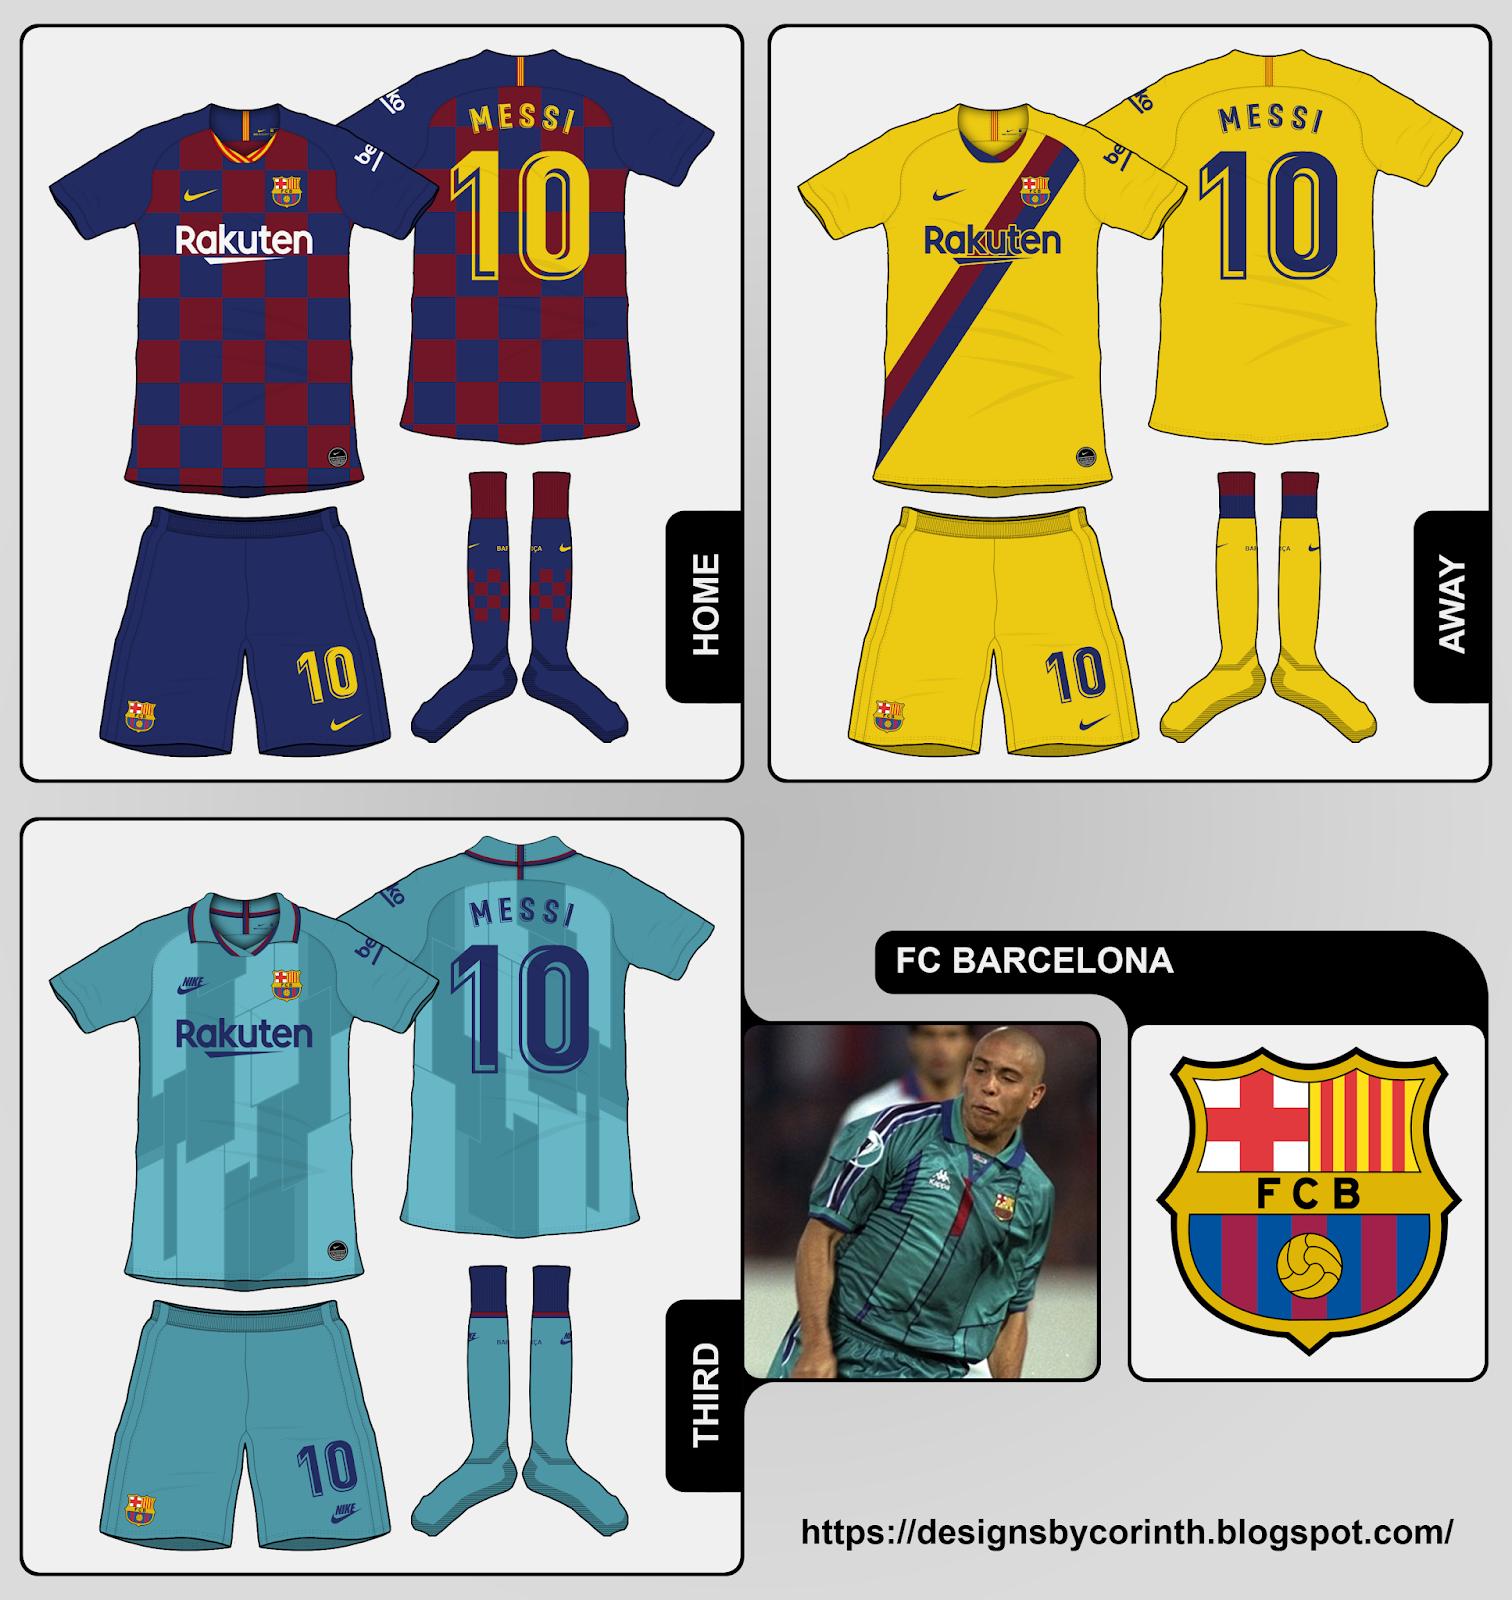 b267b29024f Barcelona 2019-20 kit predictions (based on leaks)